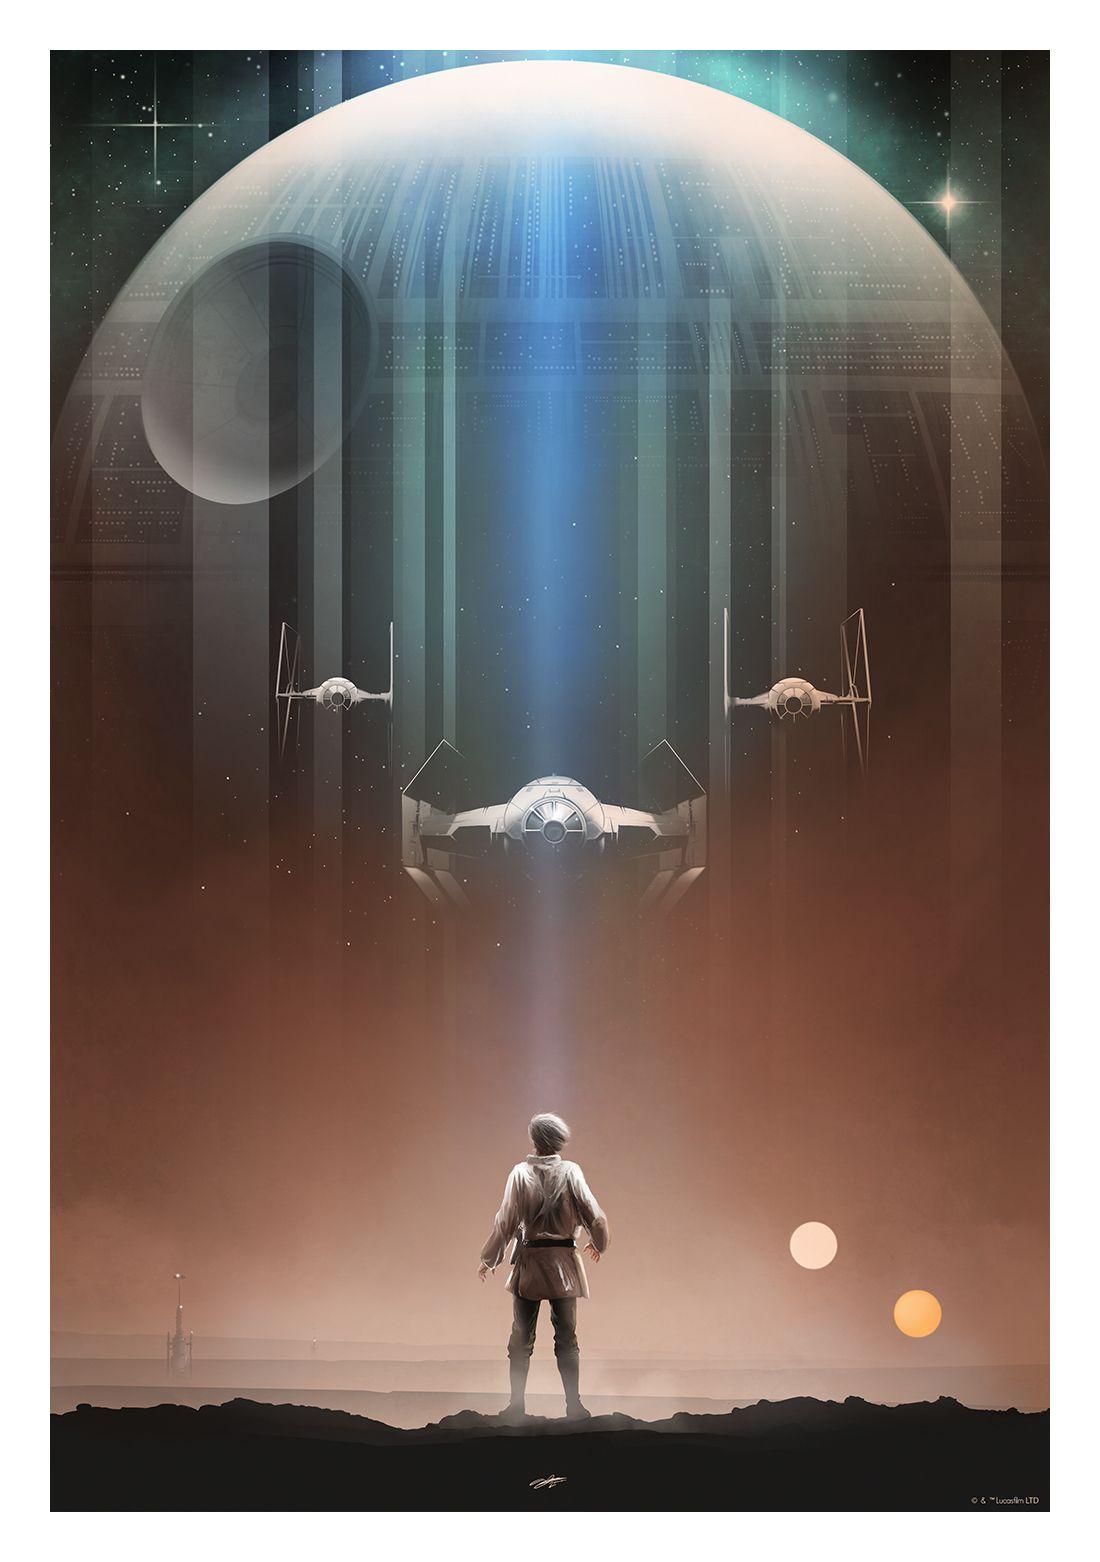 Officiall Star Wars Prints For Bottleneck Gallery Star Wars Poster Star Wars Art Star Wars Wallpaper